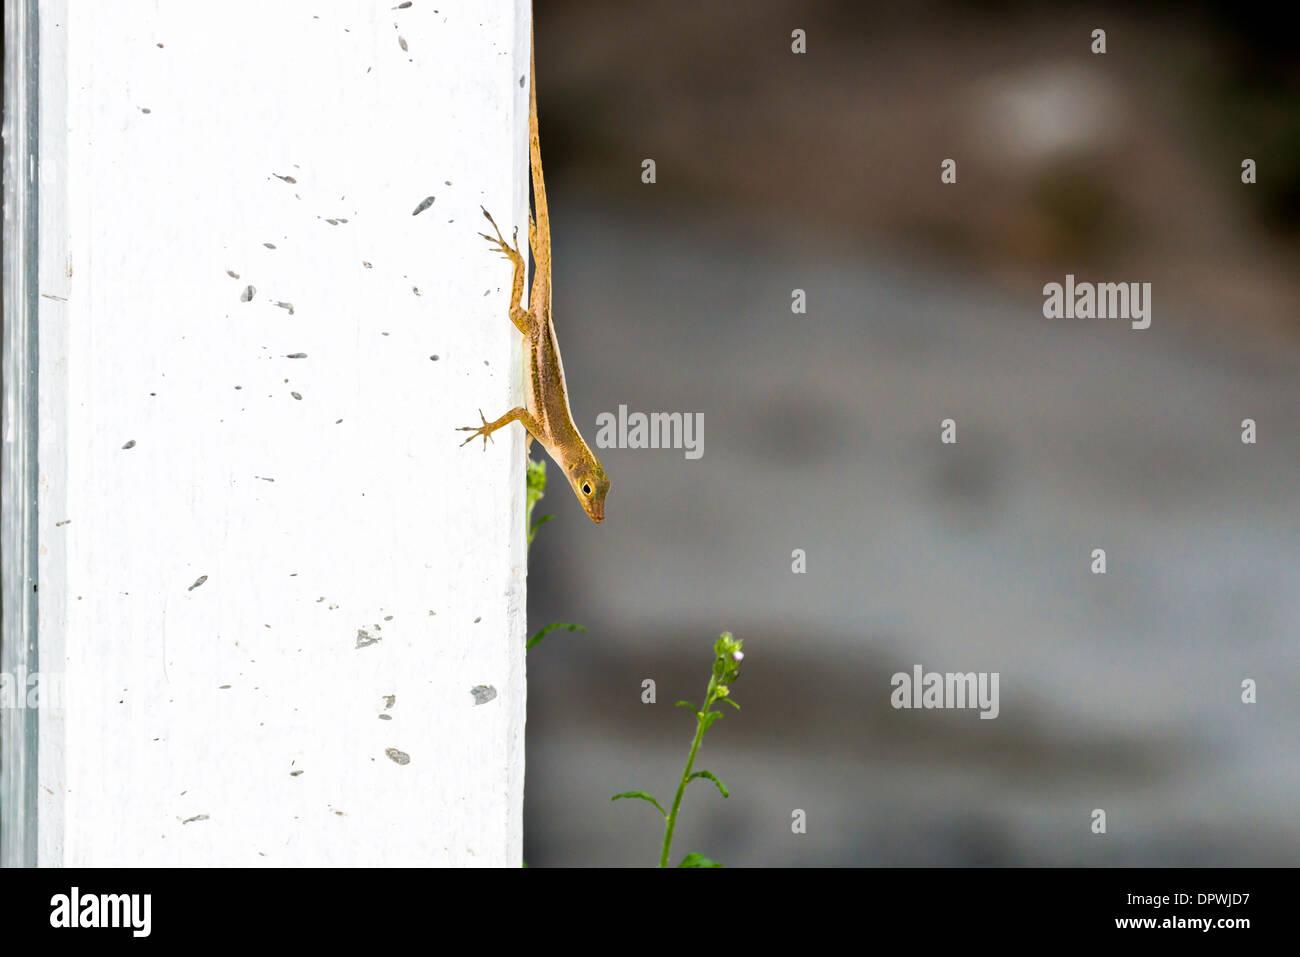 A House Gecko,, Gekkonidae, Hemedactylus frenatus, on the isle of St. Croix, U.S. Virgin Islands. - Stock Image